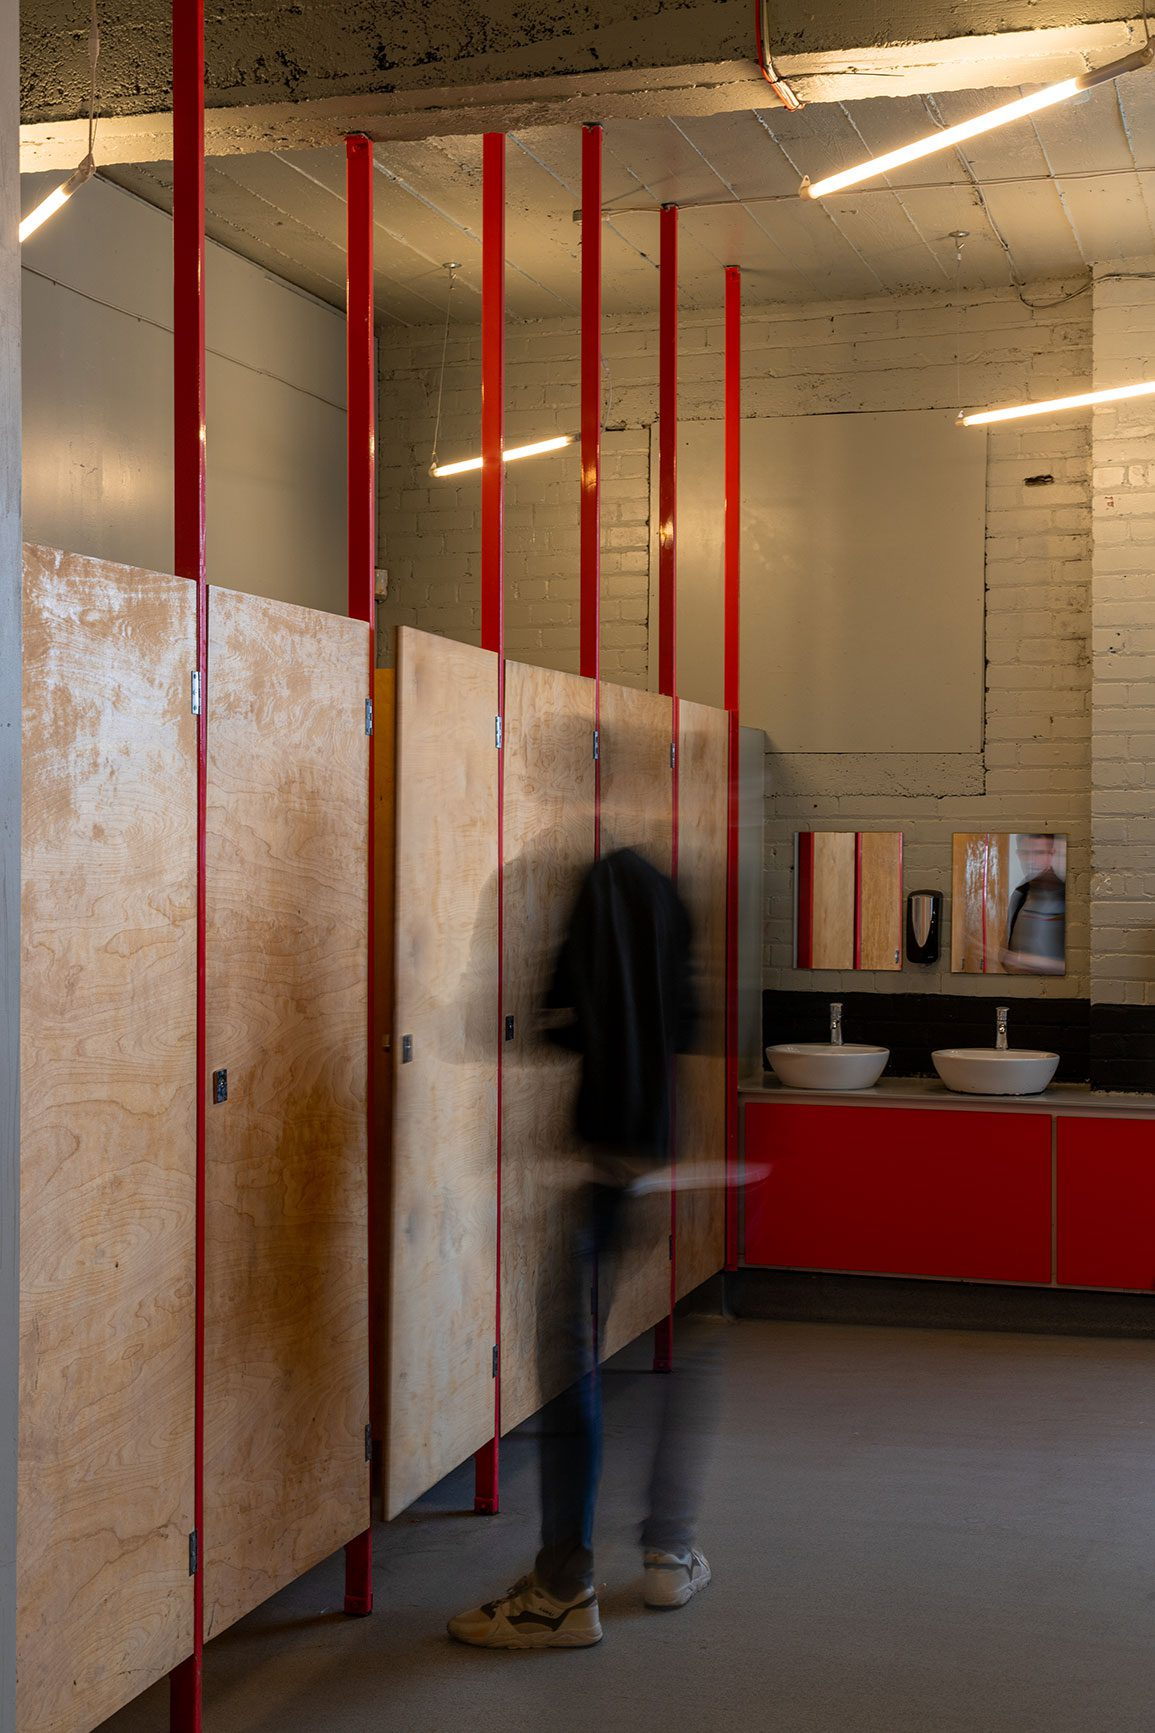 Camp and Furnace Architectural Emporium Toilets Photo: Matthew Westgate